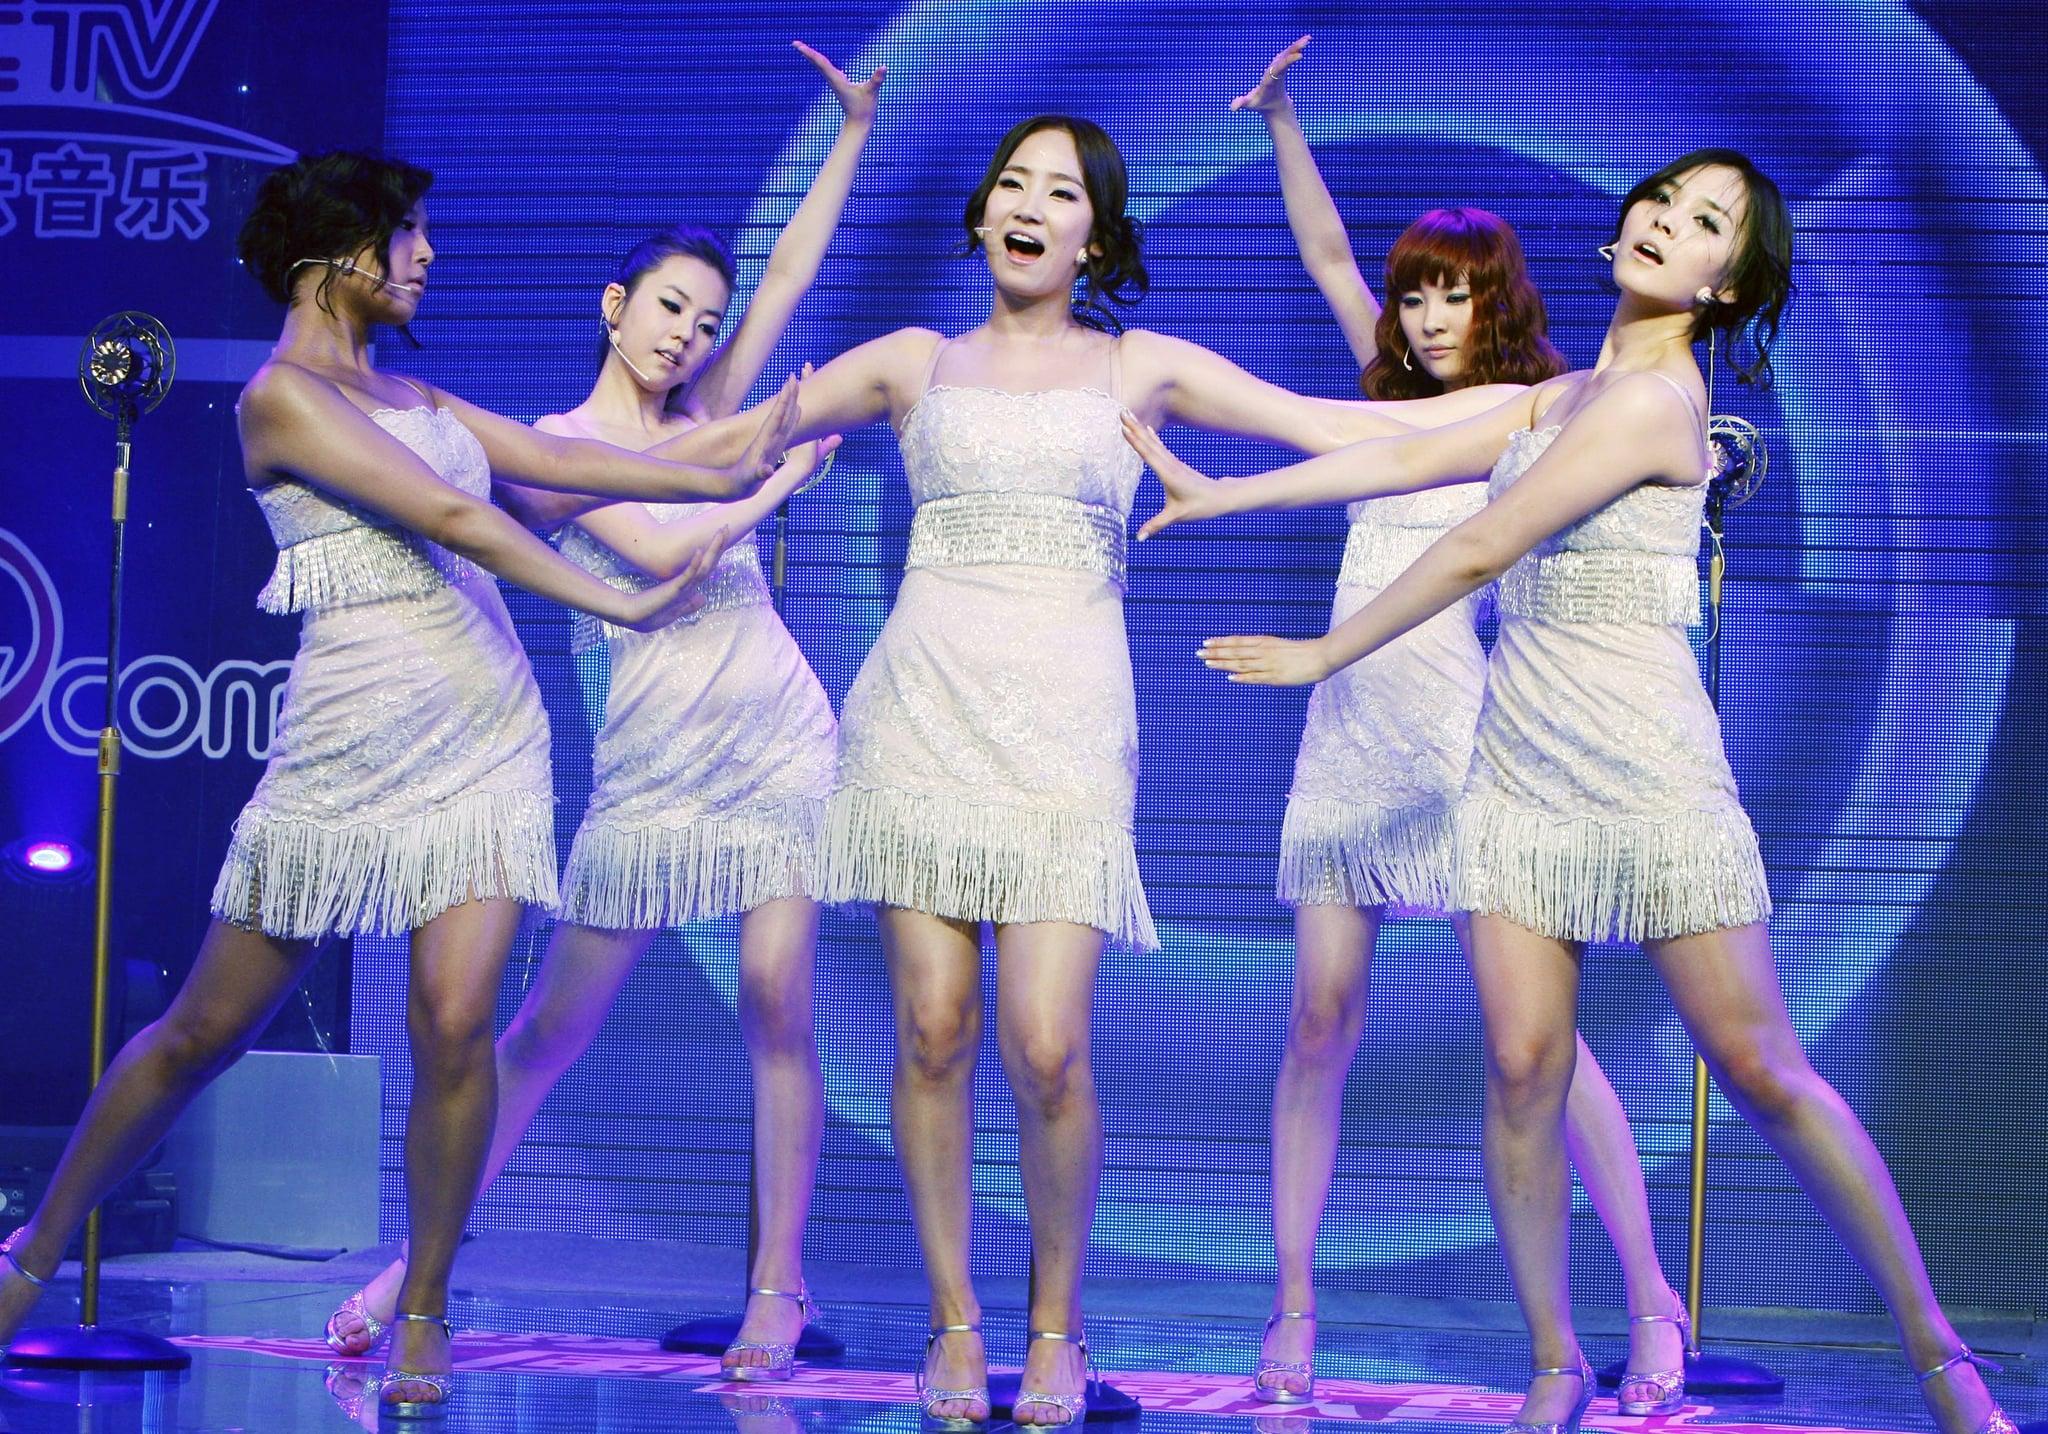 BEIJING, CHINE - 11 juin: (Chine) groupe de filles sud-coréen Wonder Girls effectuer lors d'une réunion de fans le 11 juin 2009 à Beijing, Chine.  (Photo par Zhao Kang / Visual China Group via Getty Images)